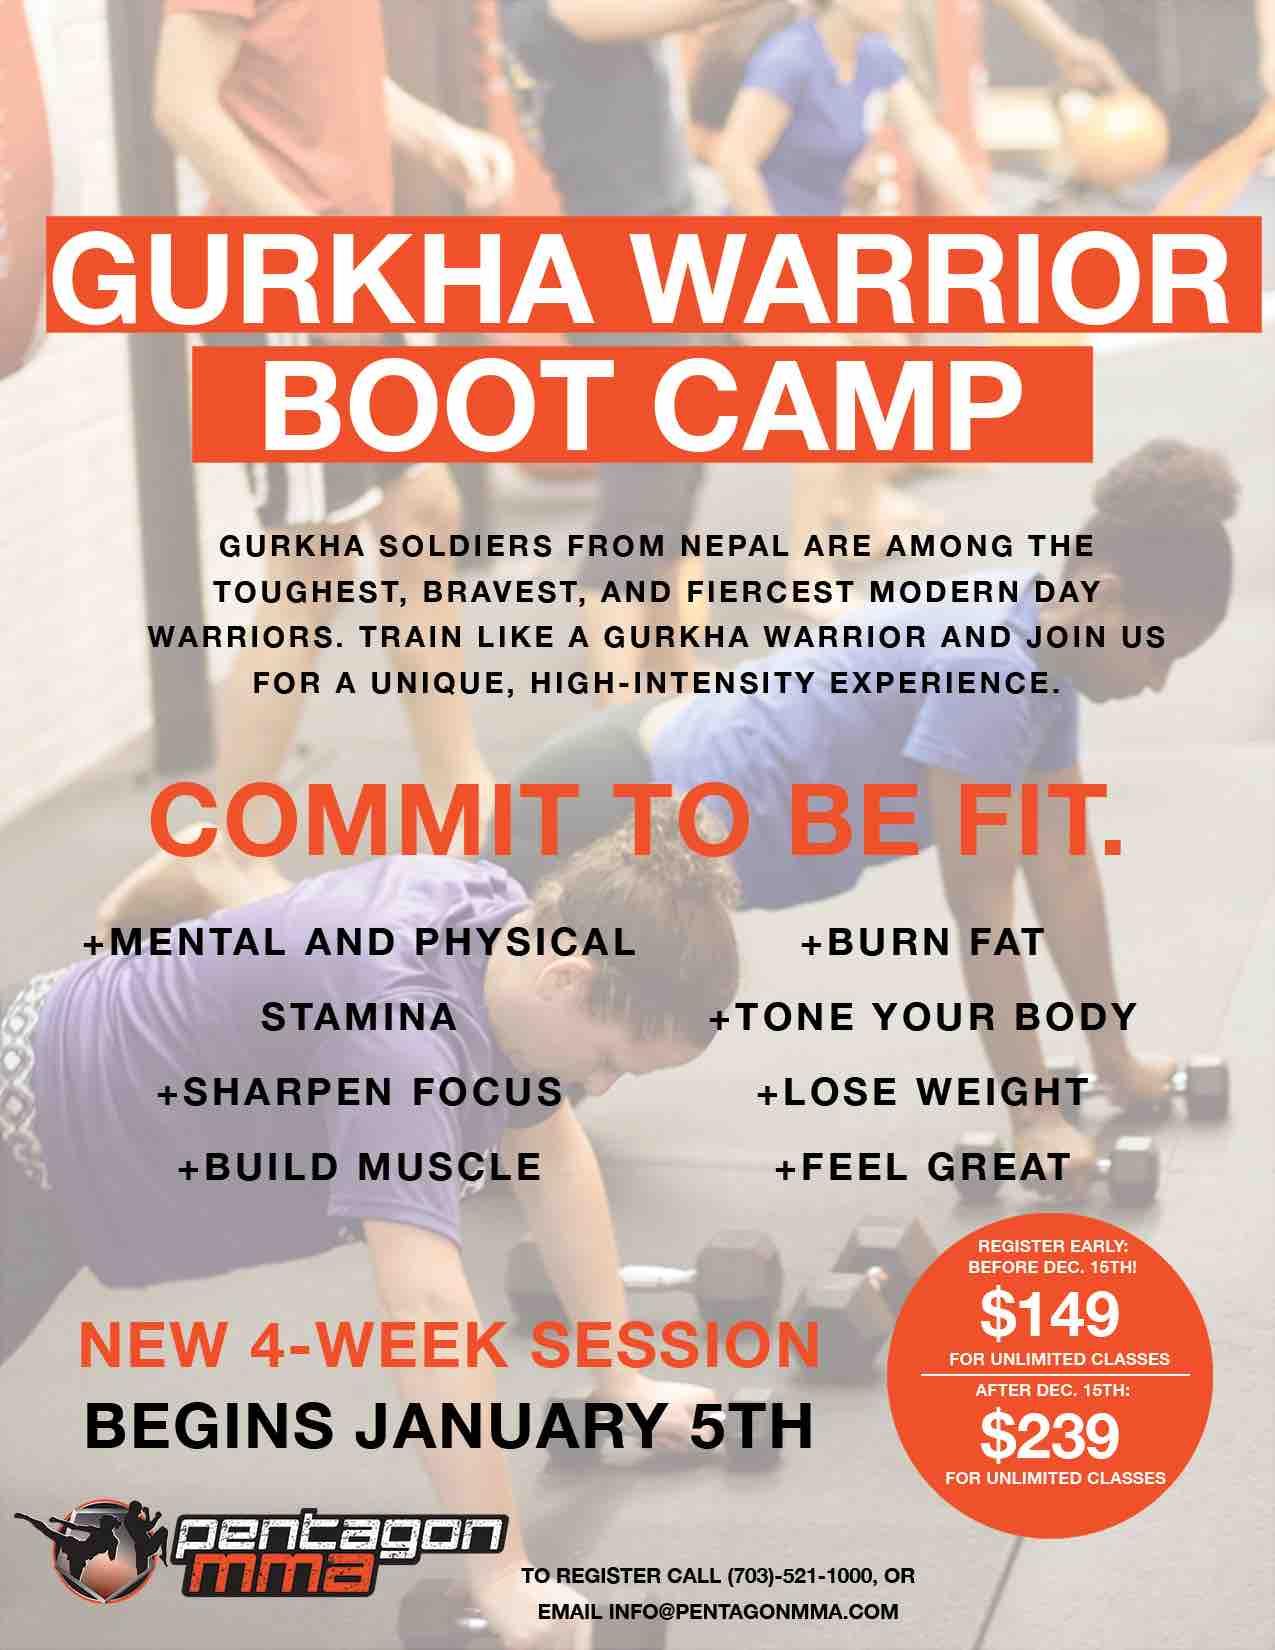 gurkhawarriorbootcamp